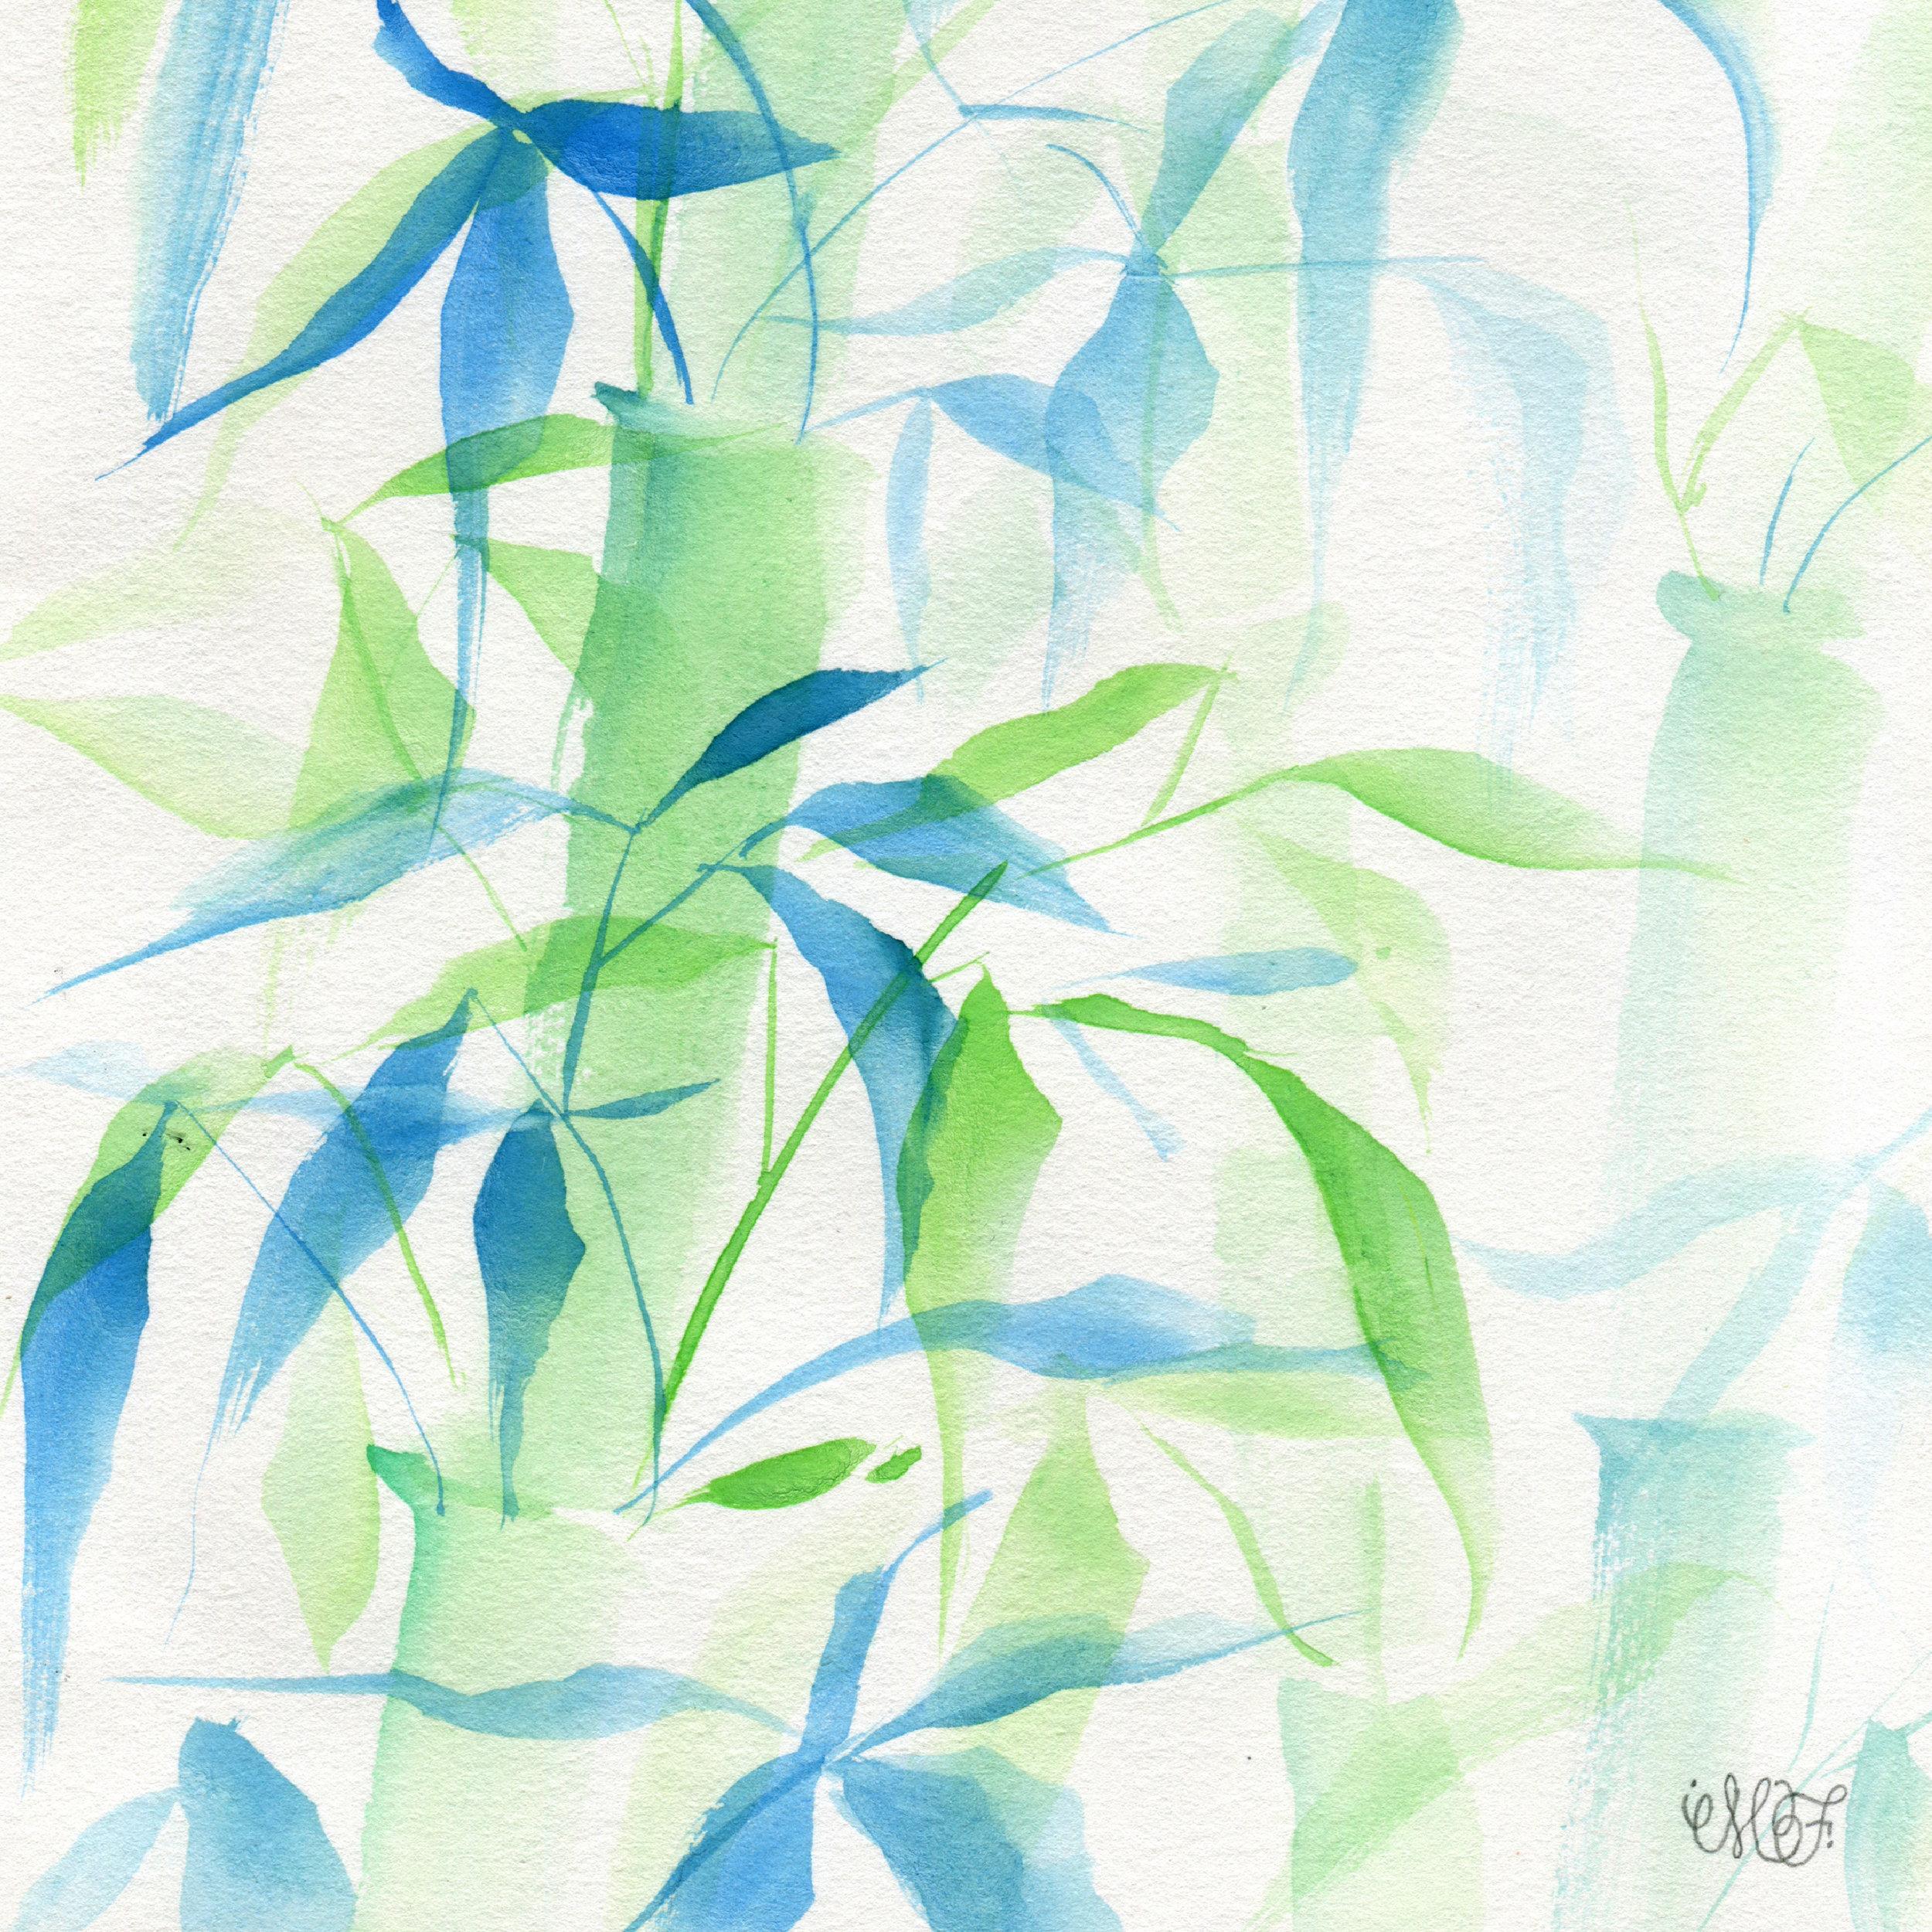 MirandaFuller-Nashville-WatercolorChinesePainting-Bamboo.jpg